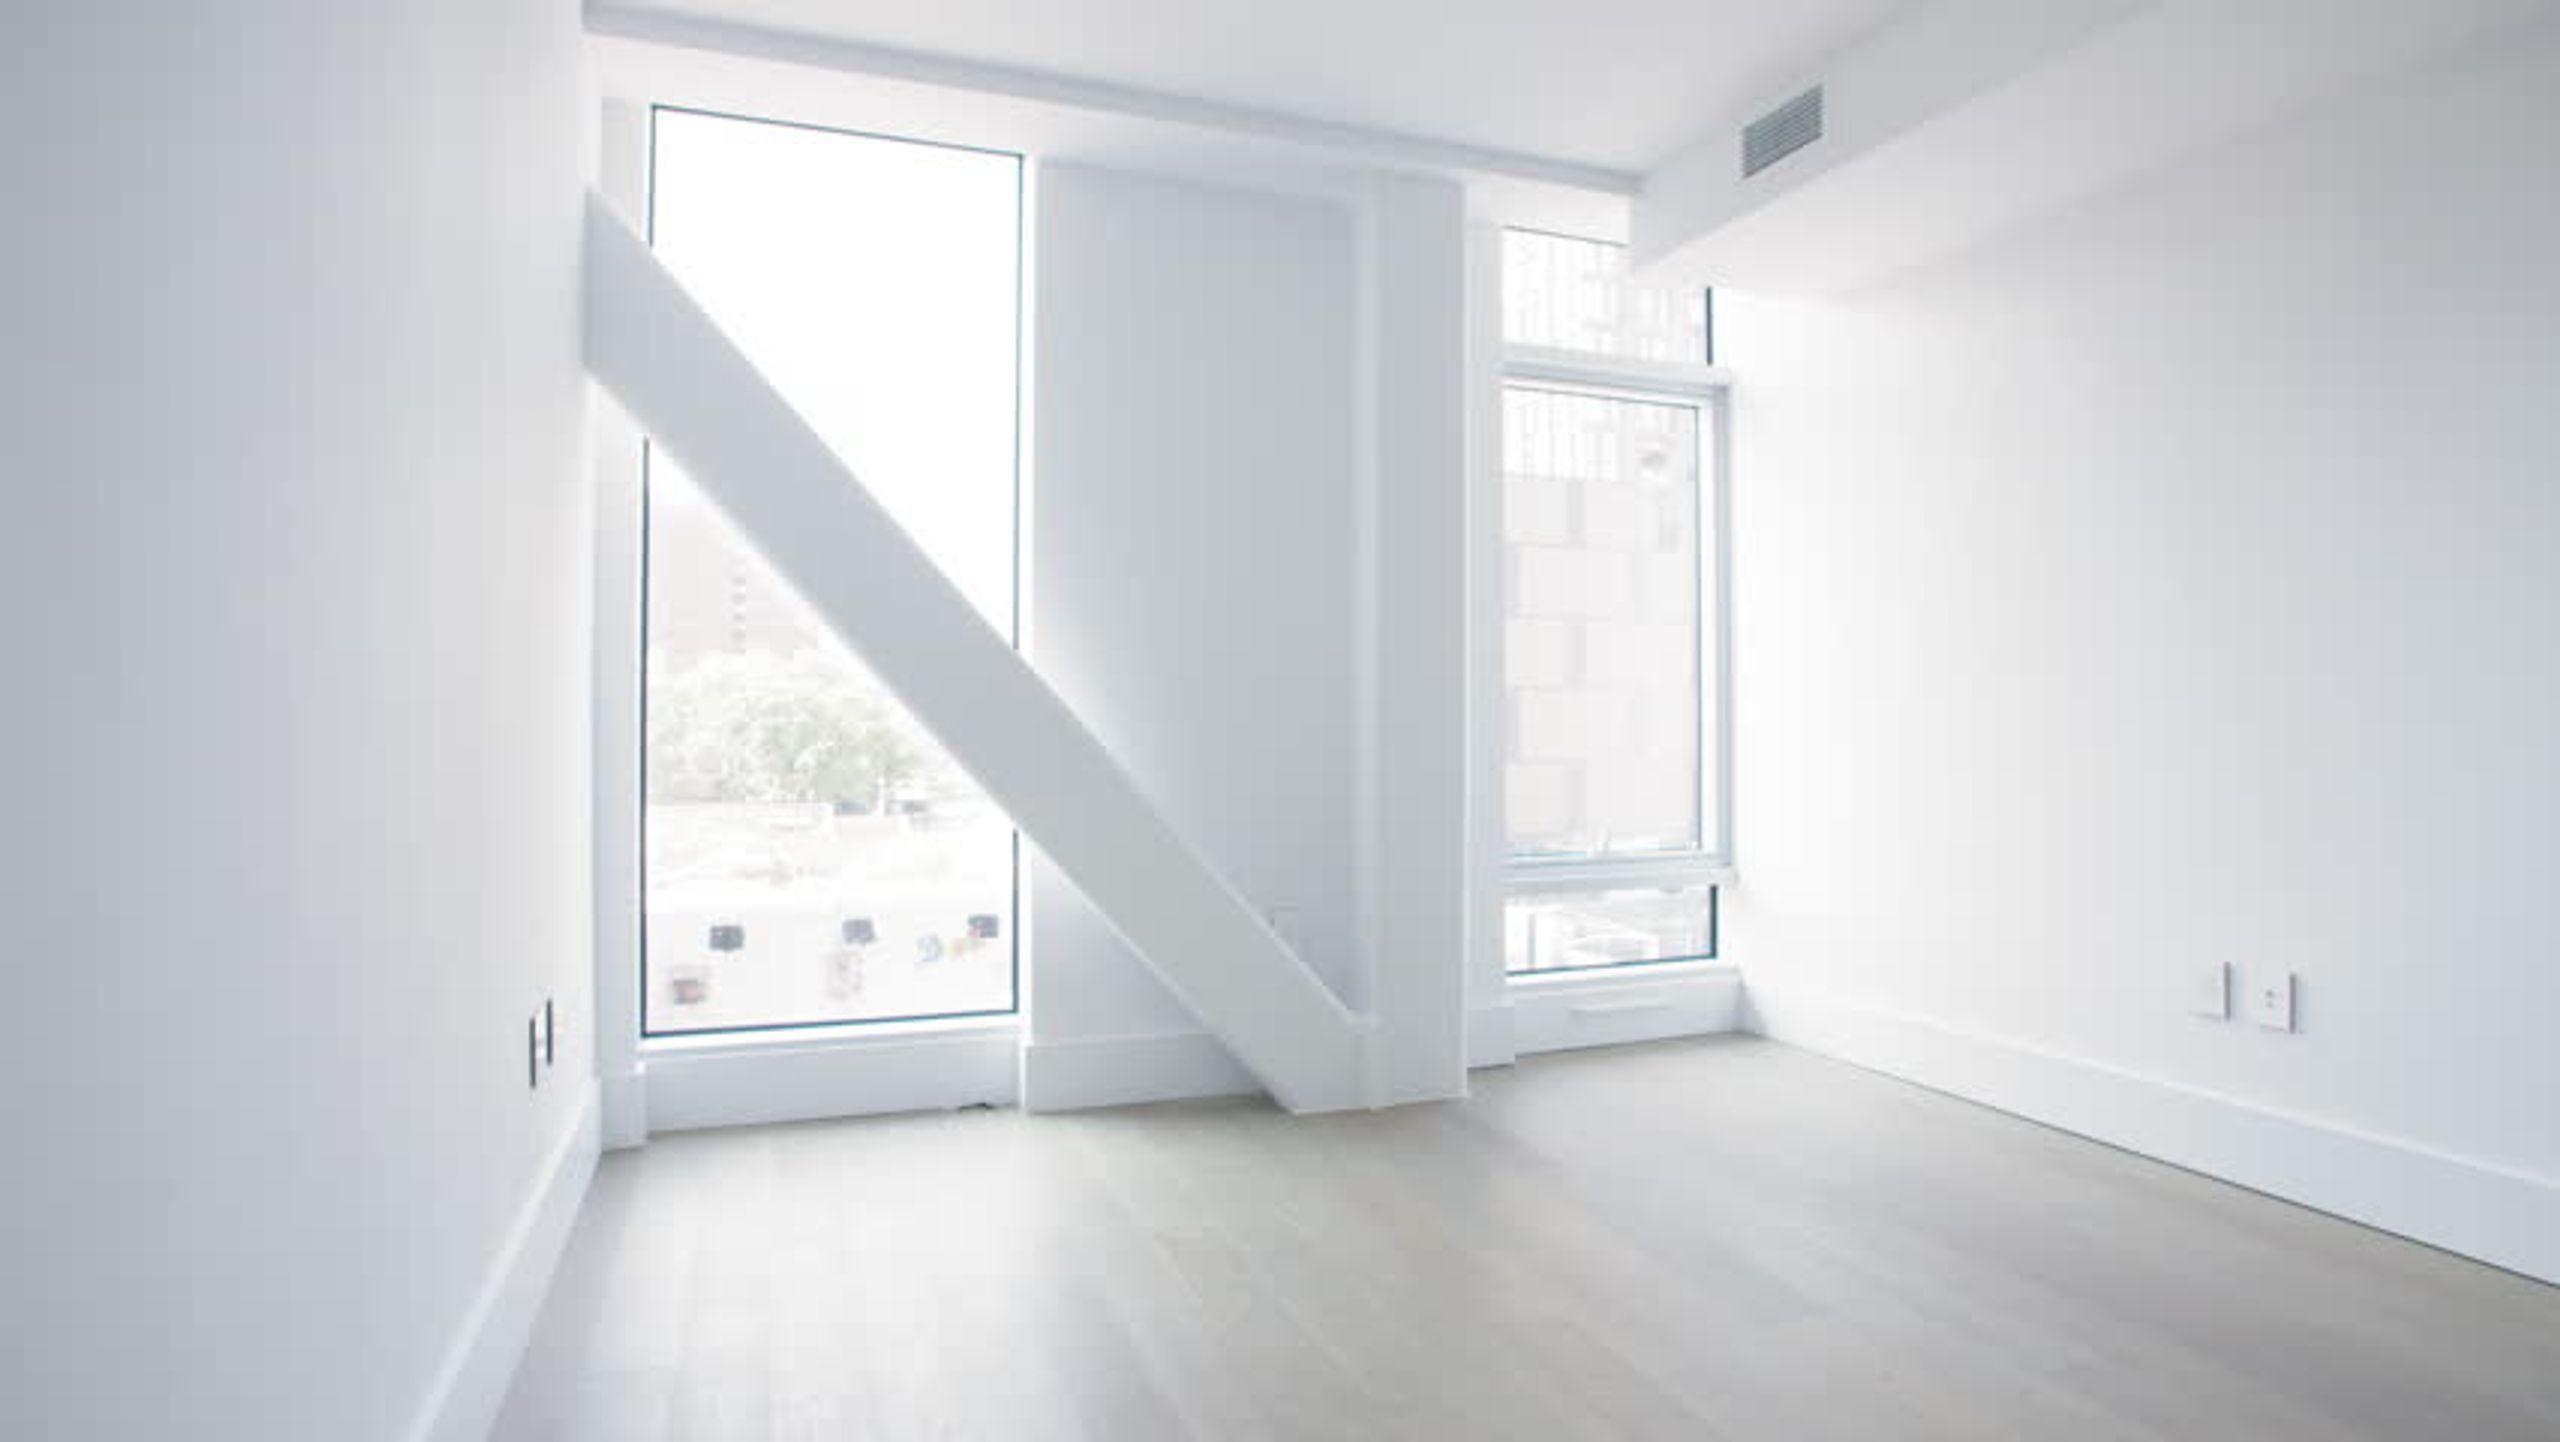 21x10 Bedroom self storage unit